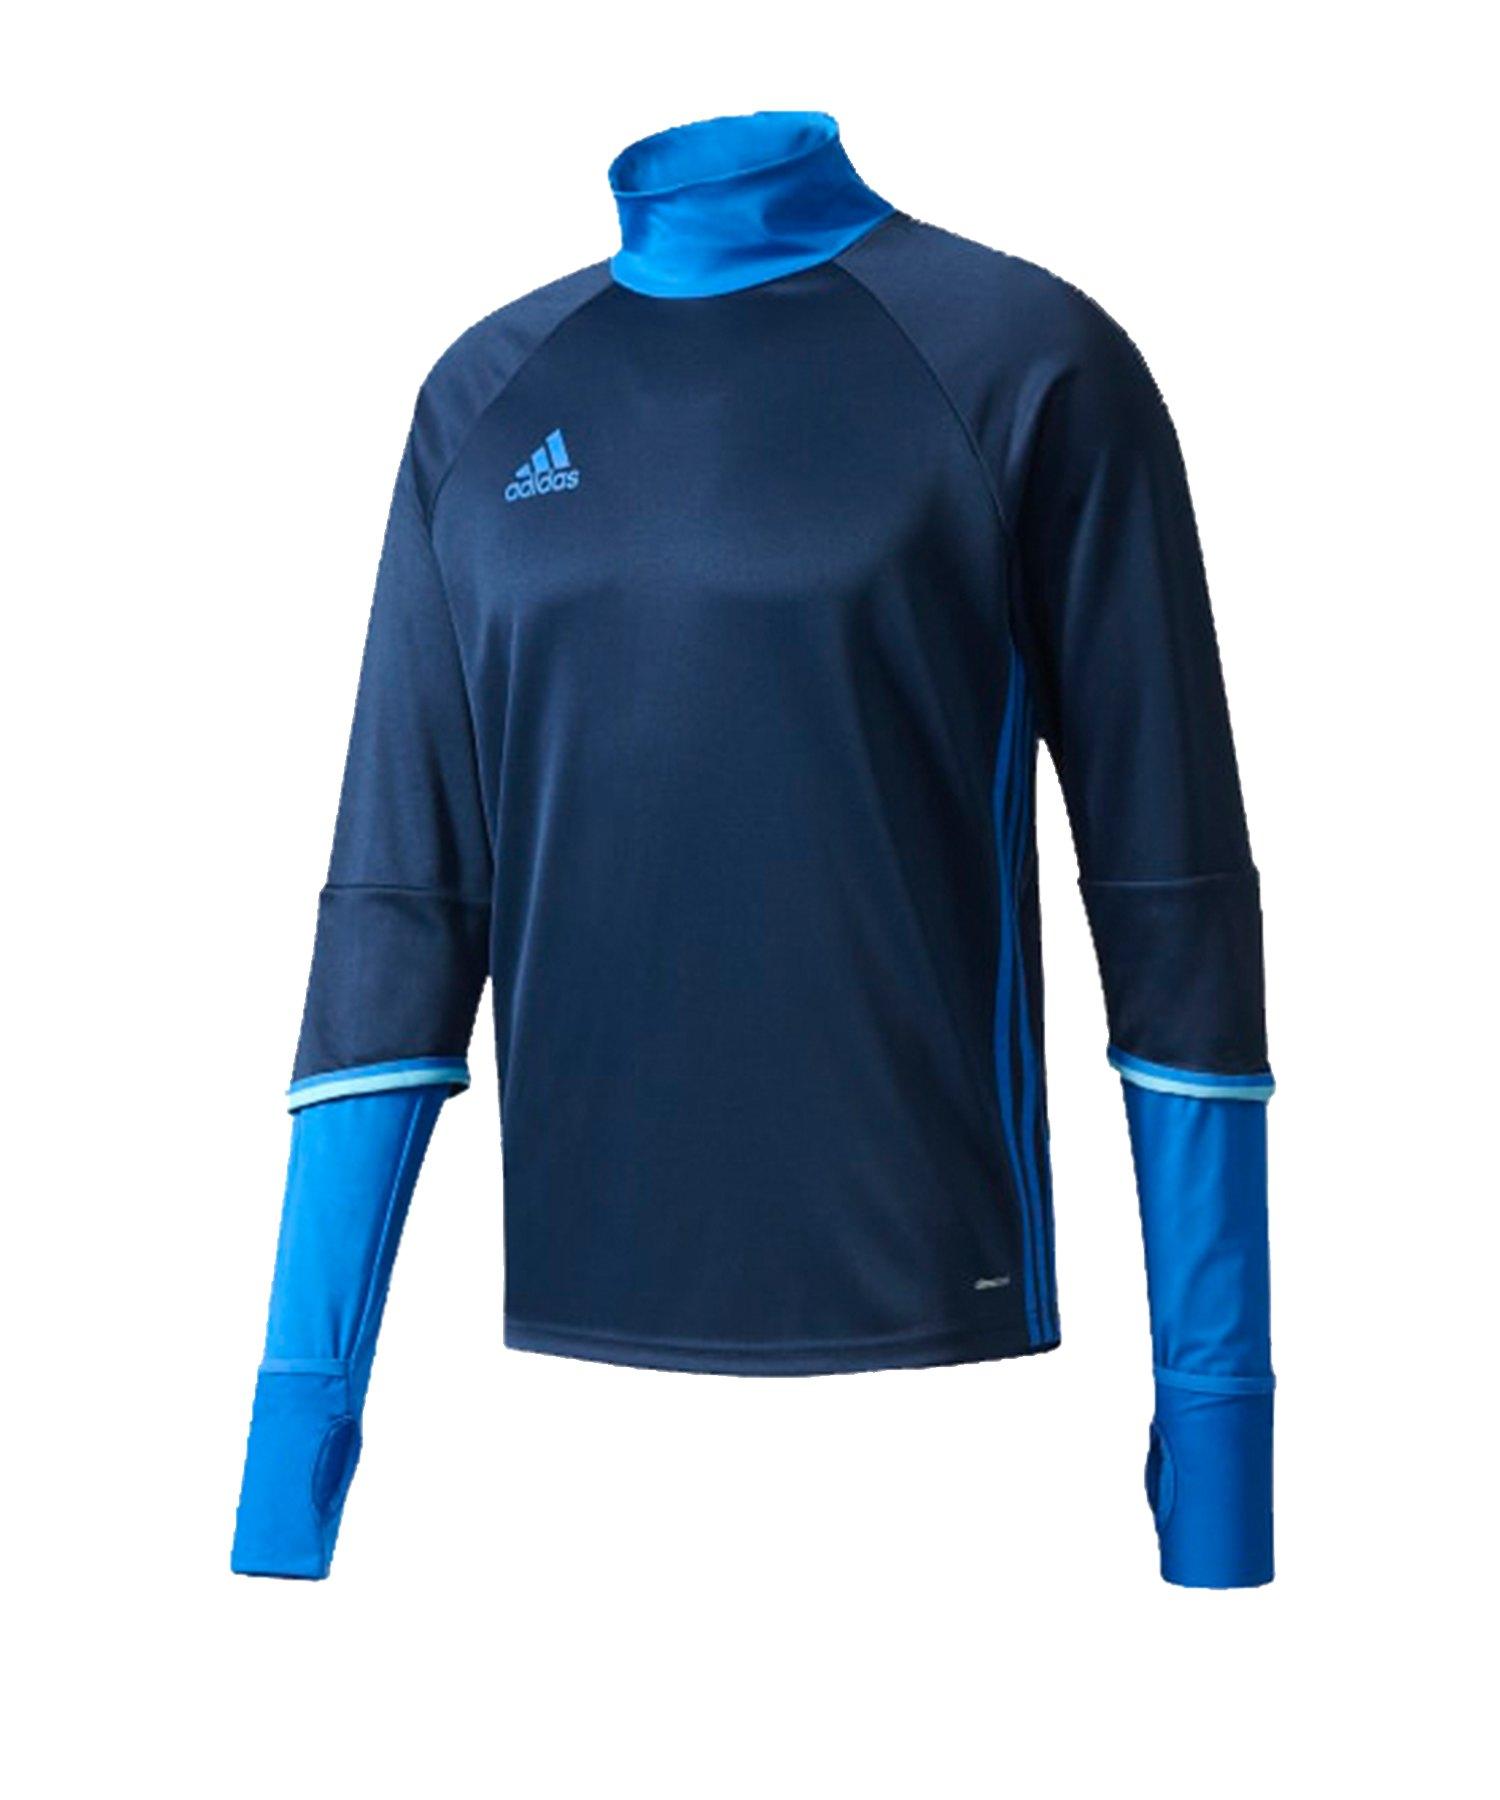 adidas Condivo 16 Training Top Dunkelblau - blau